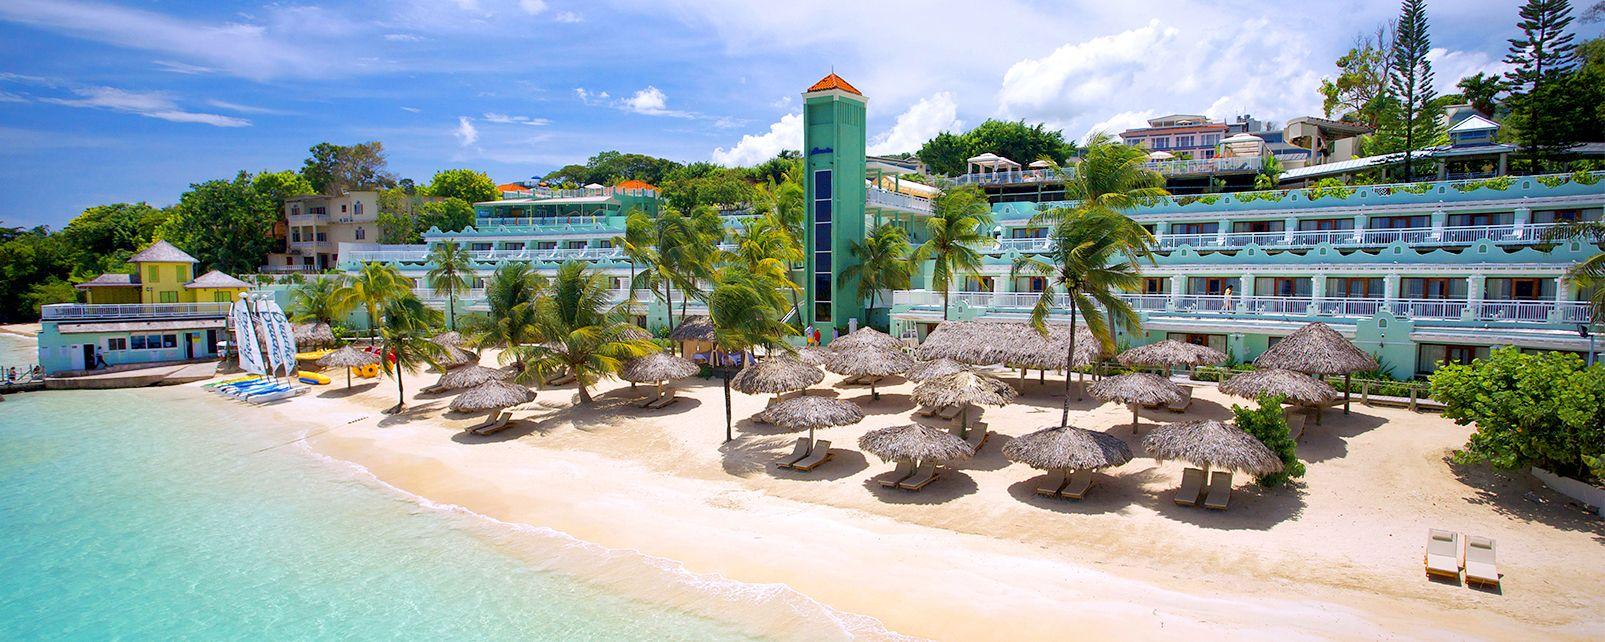 Hôtel Beaches Ocho Rios